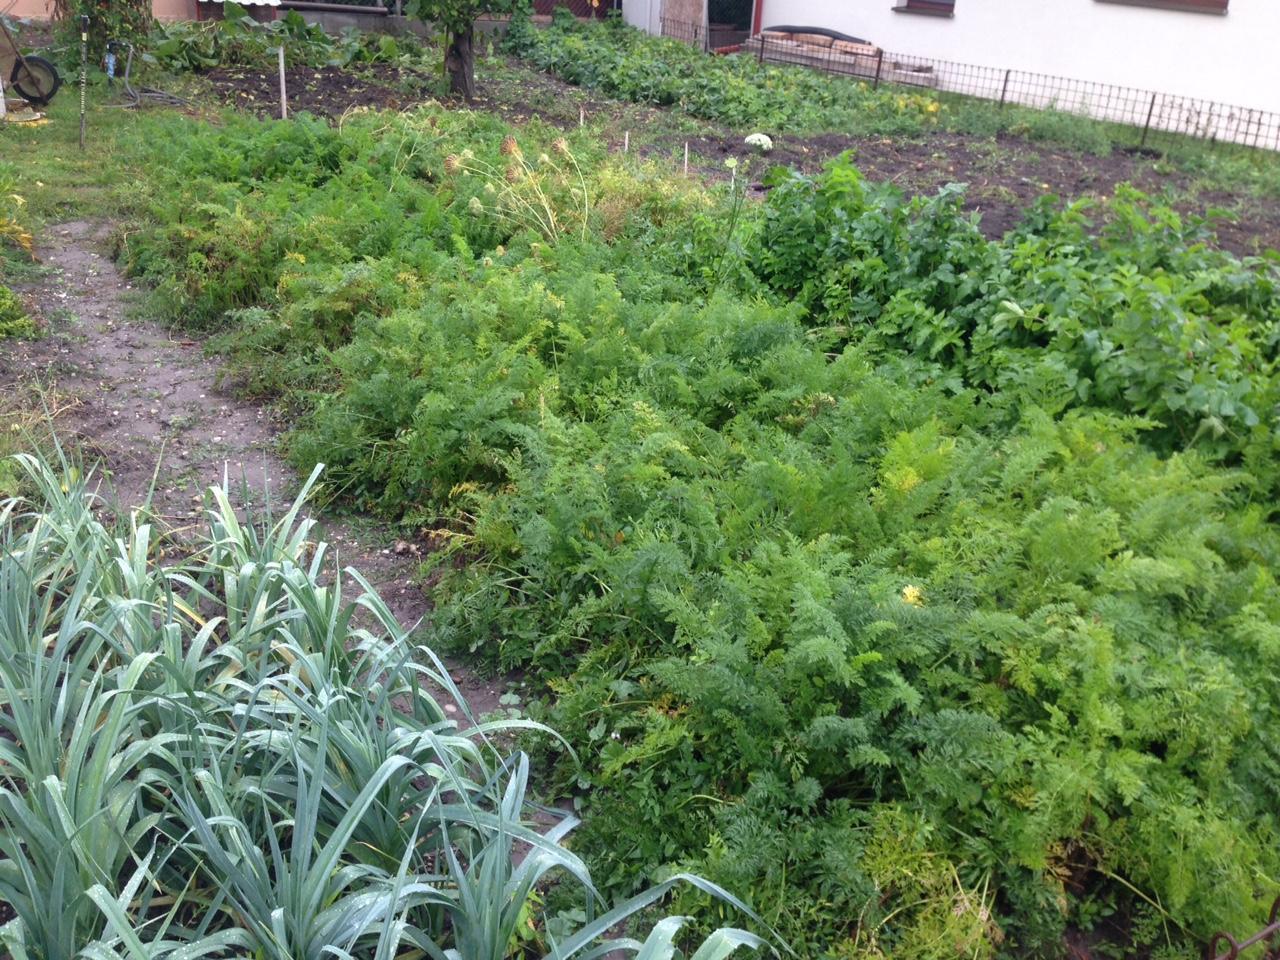 Zopár fotografií zo záhradky.... - Obrázok č. 3